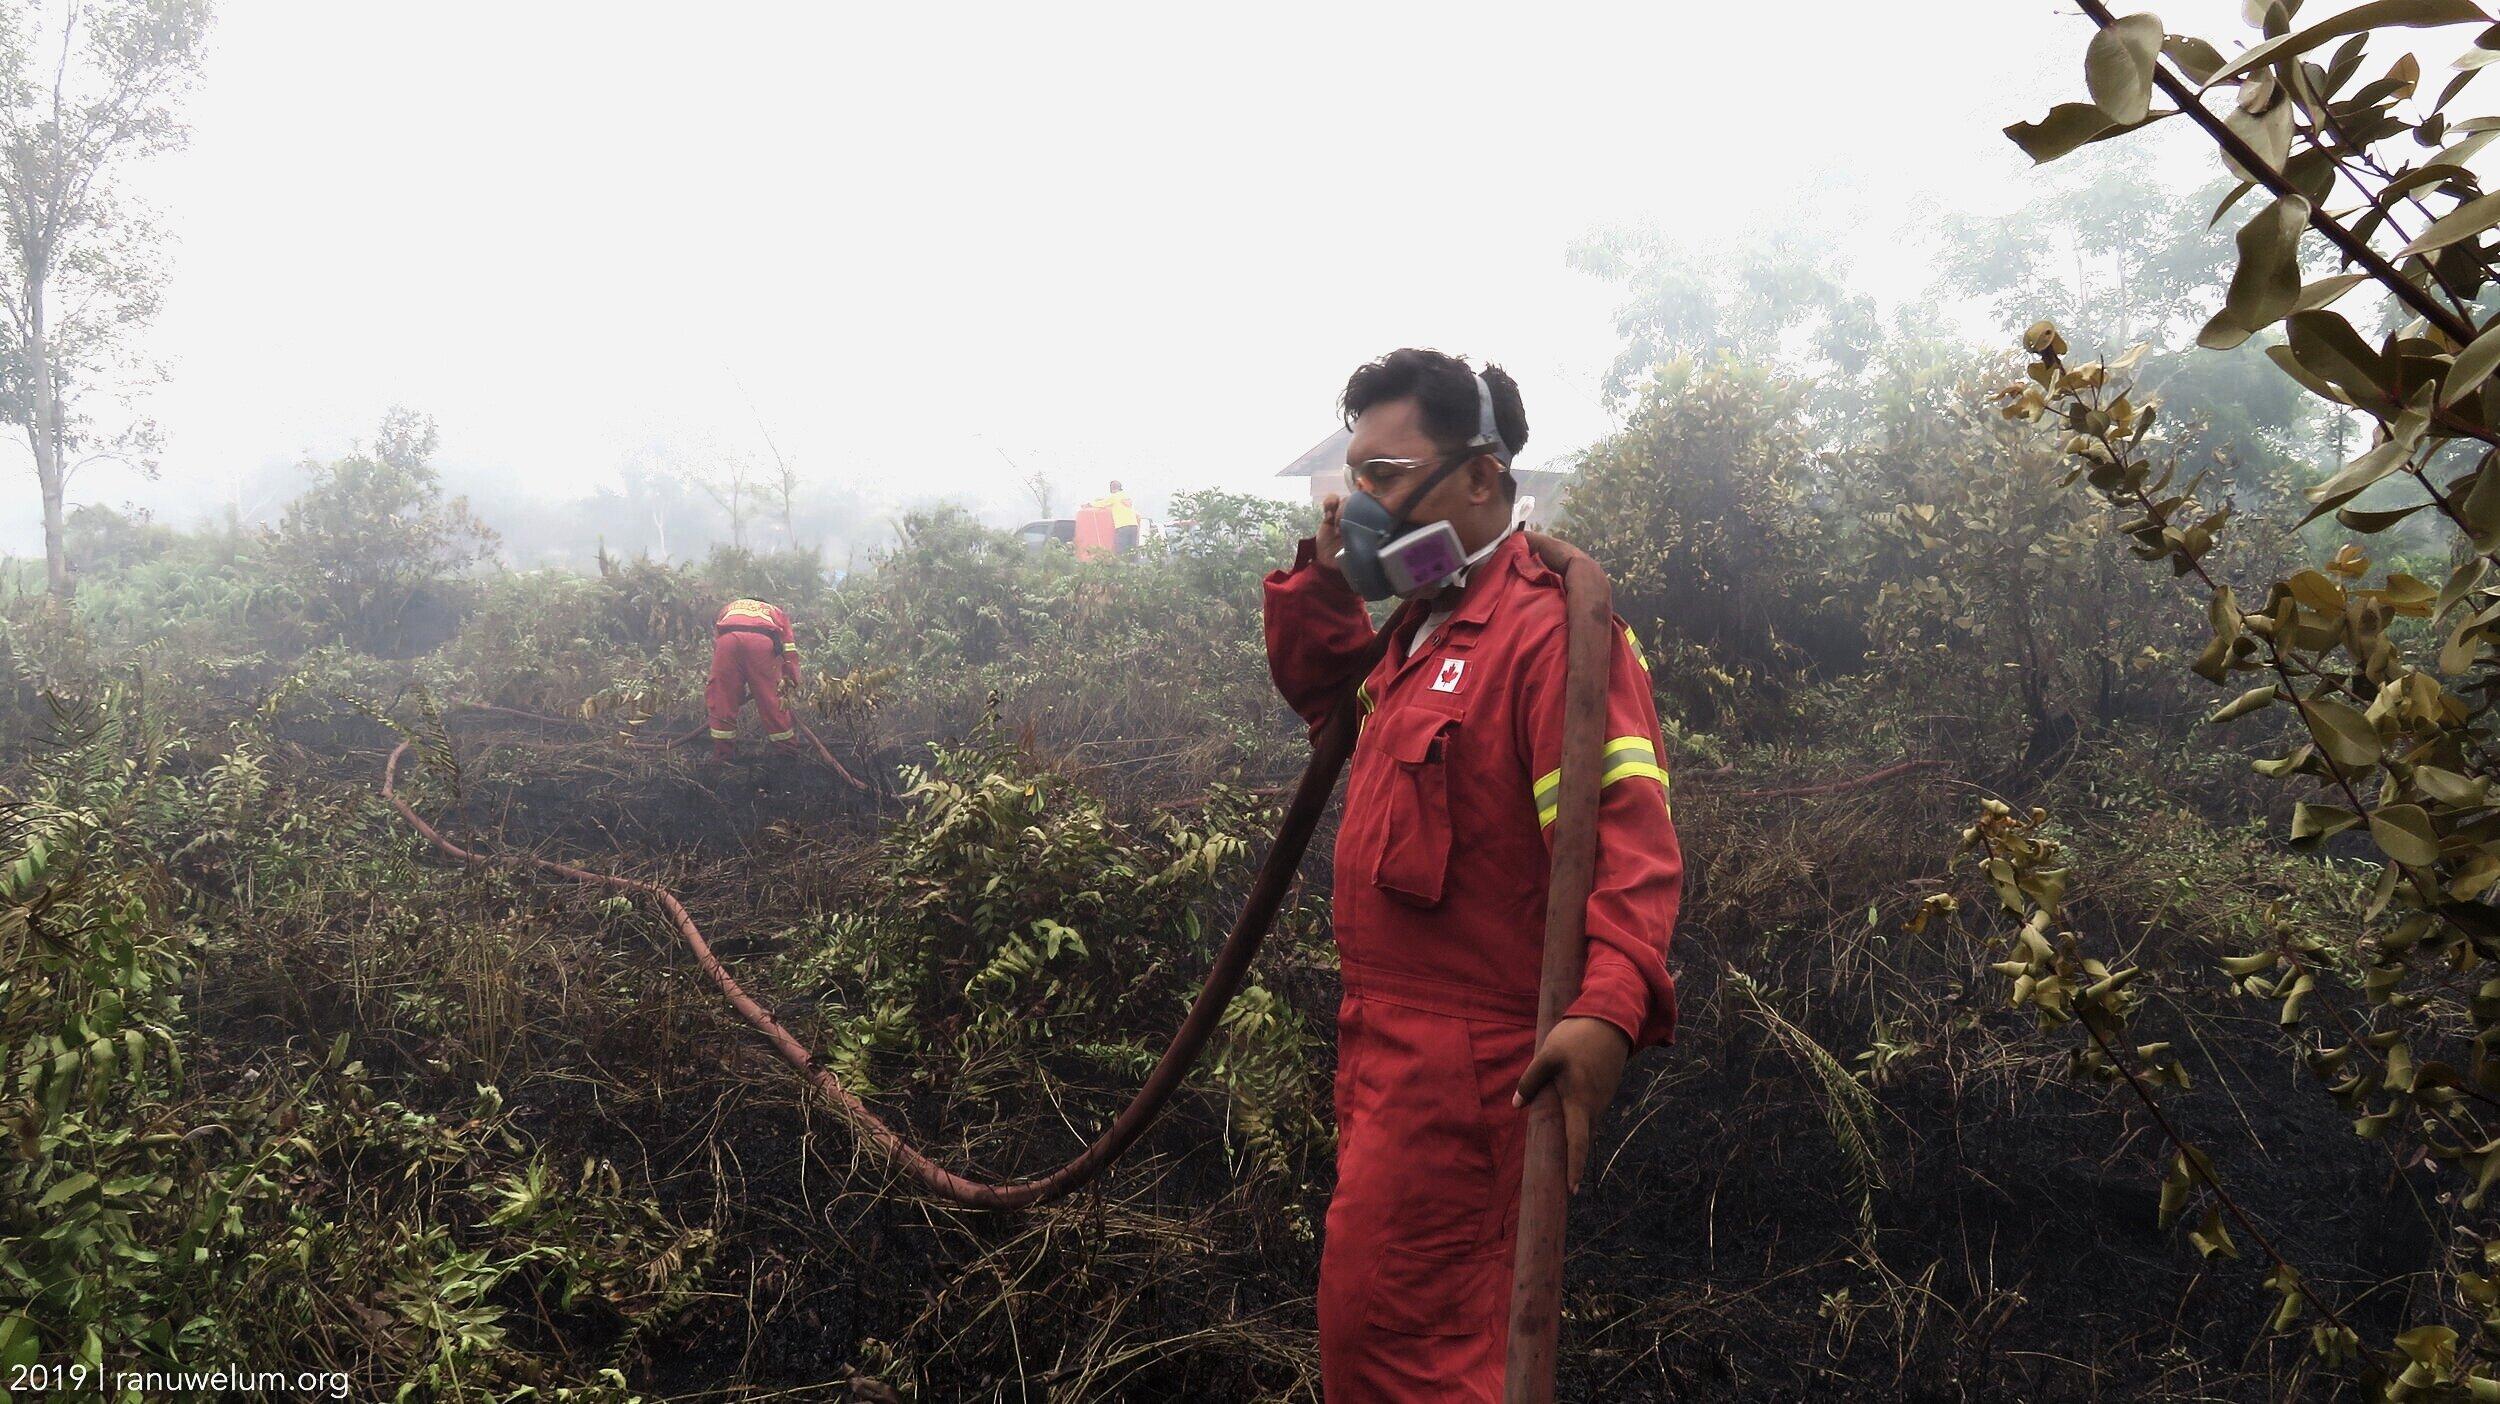 M. Maulana Razaqi, 18 years old Youth Act Volunteer in Katuyung Firefighters Team.